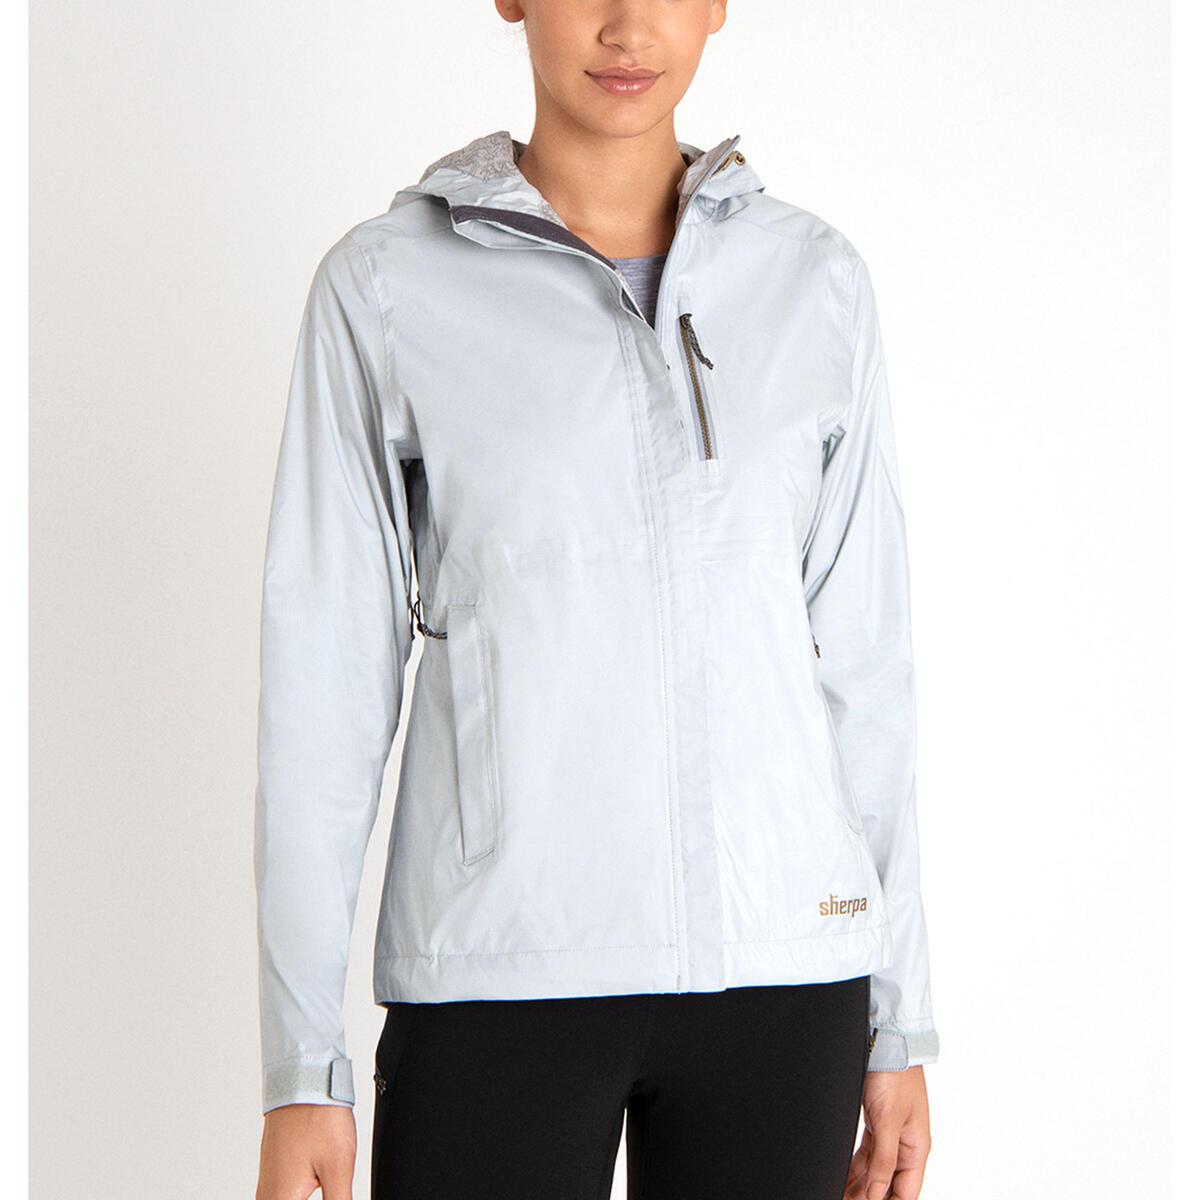 Sherpa Women's Kunde 2.5 Layer Jacket